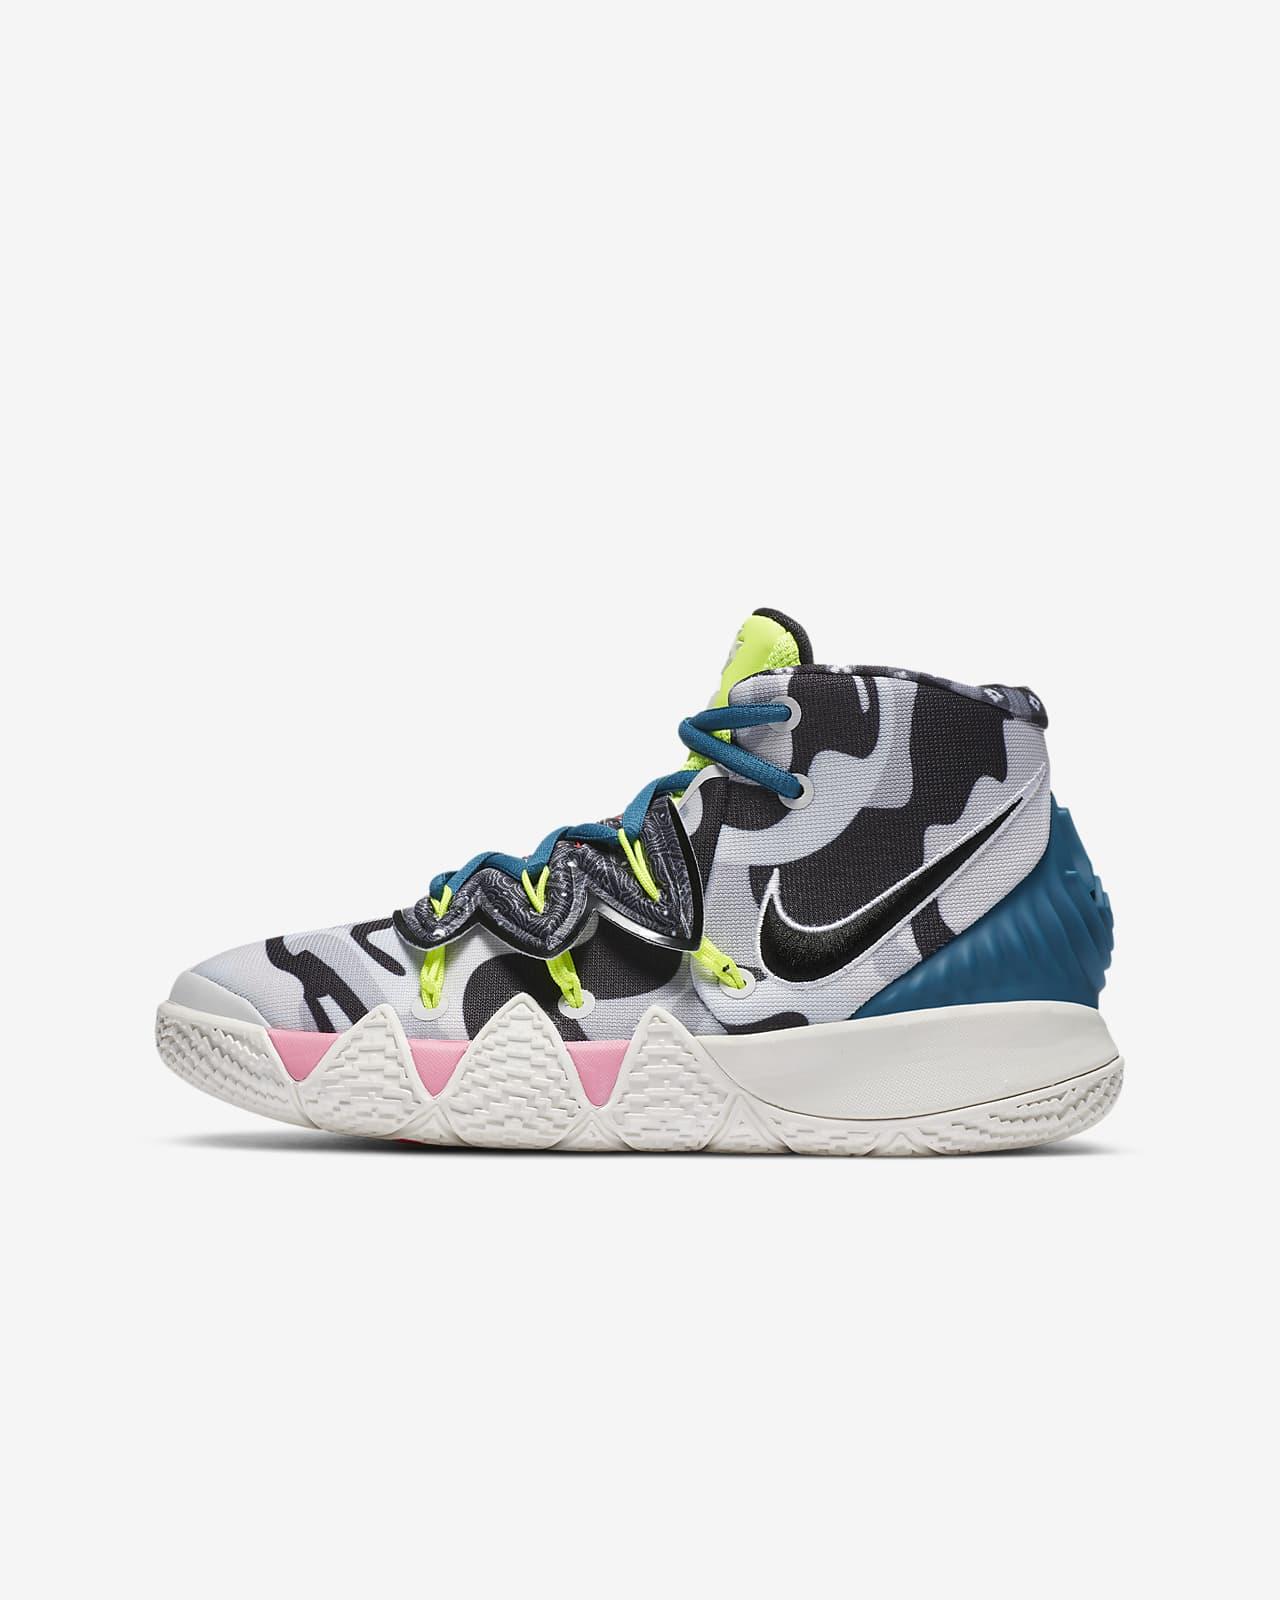 Kybrid S2 Big Kids' Basketball Shoe